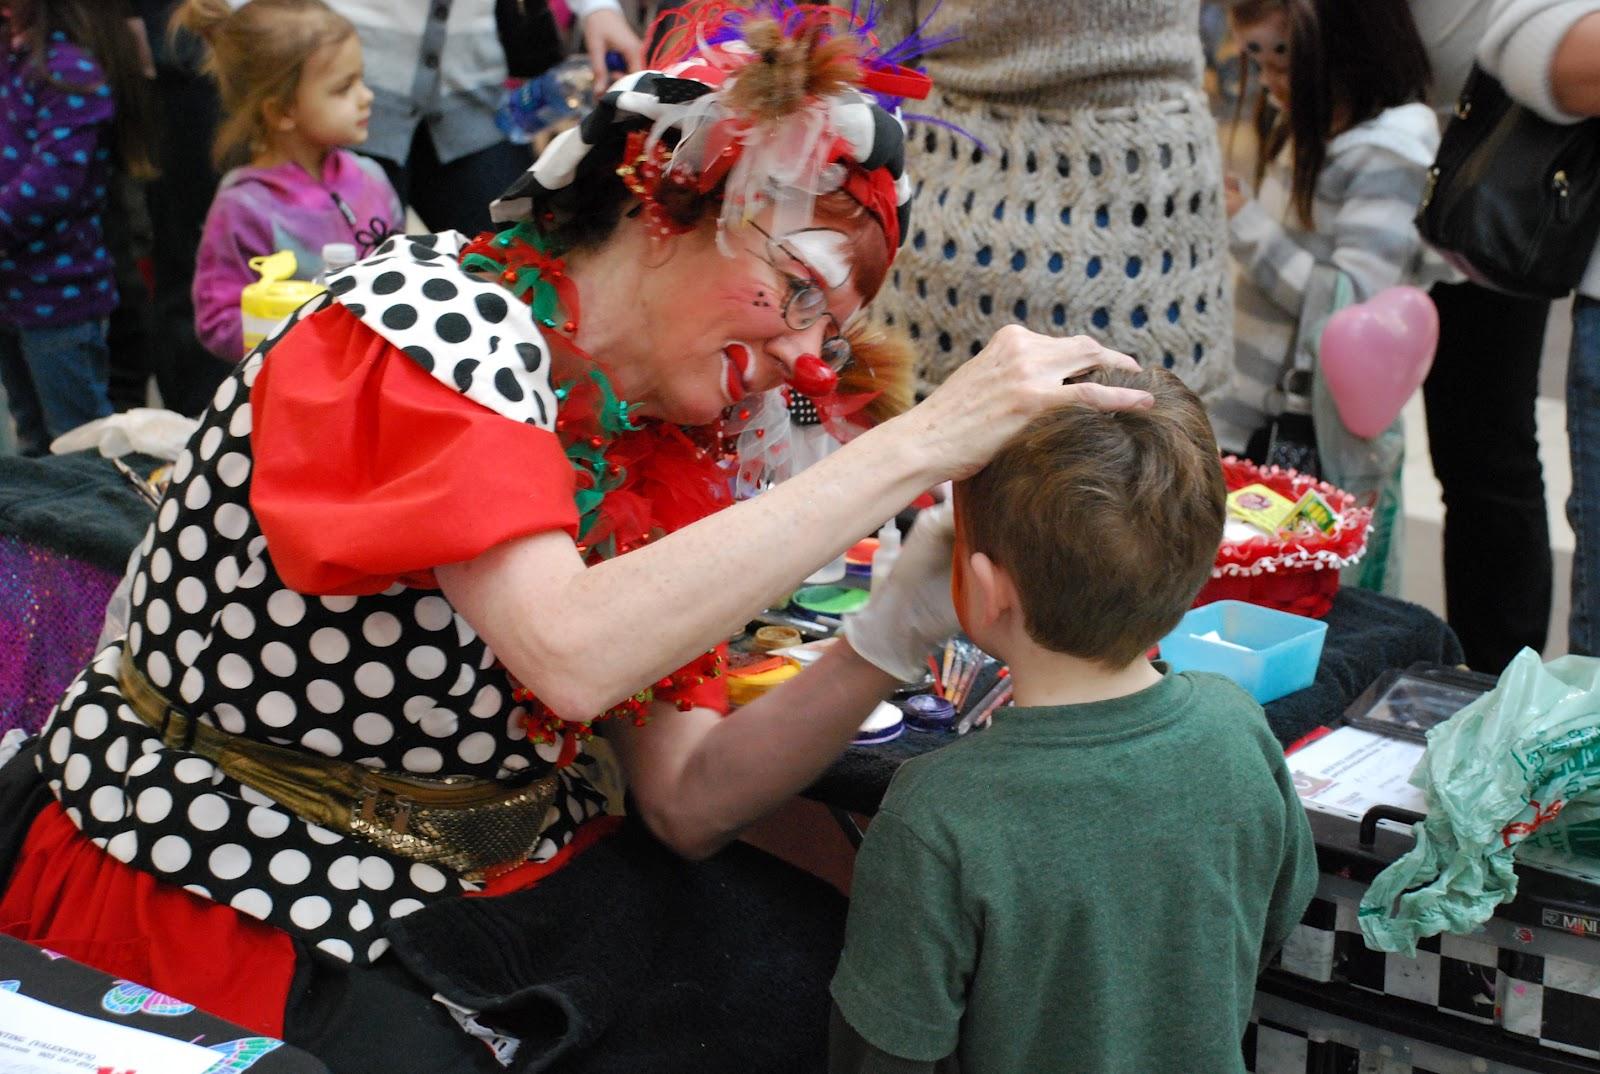 Family Day Activities In Burlington 2012 Tourism Burlington Tourism Burlington